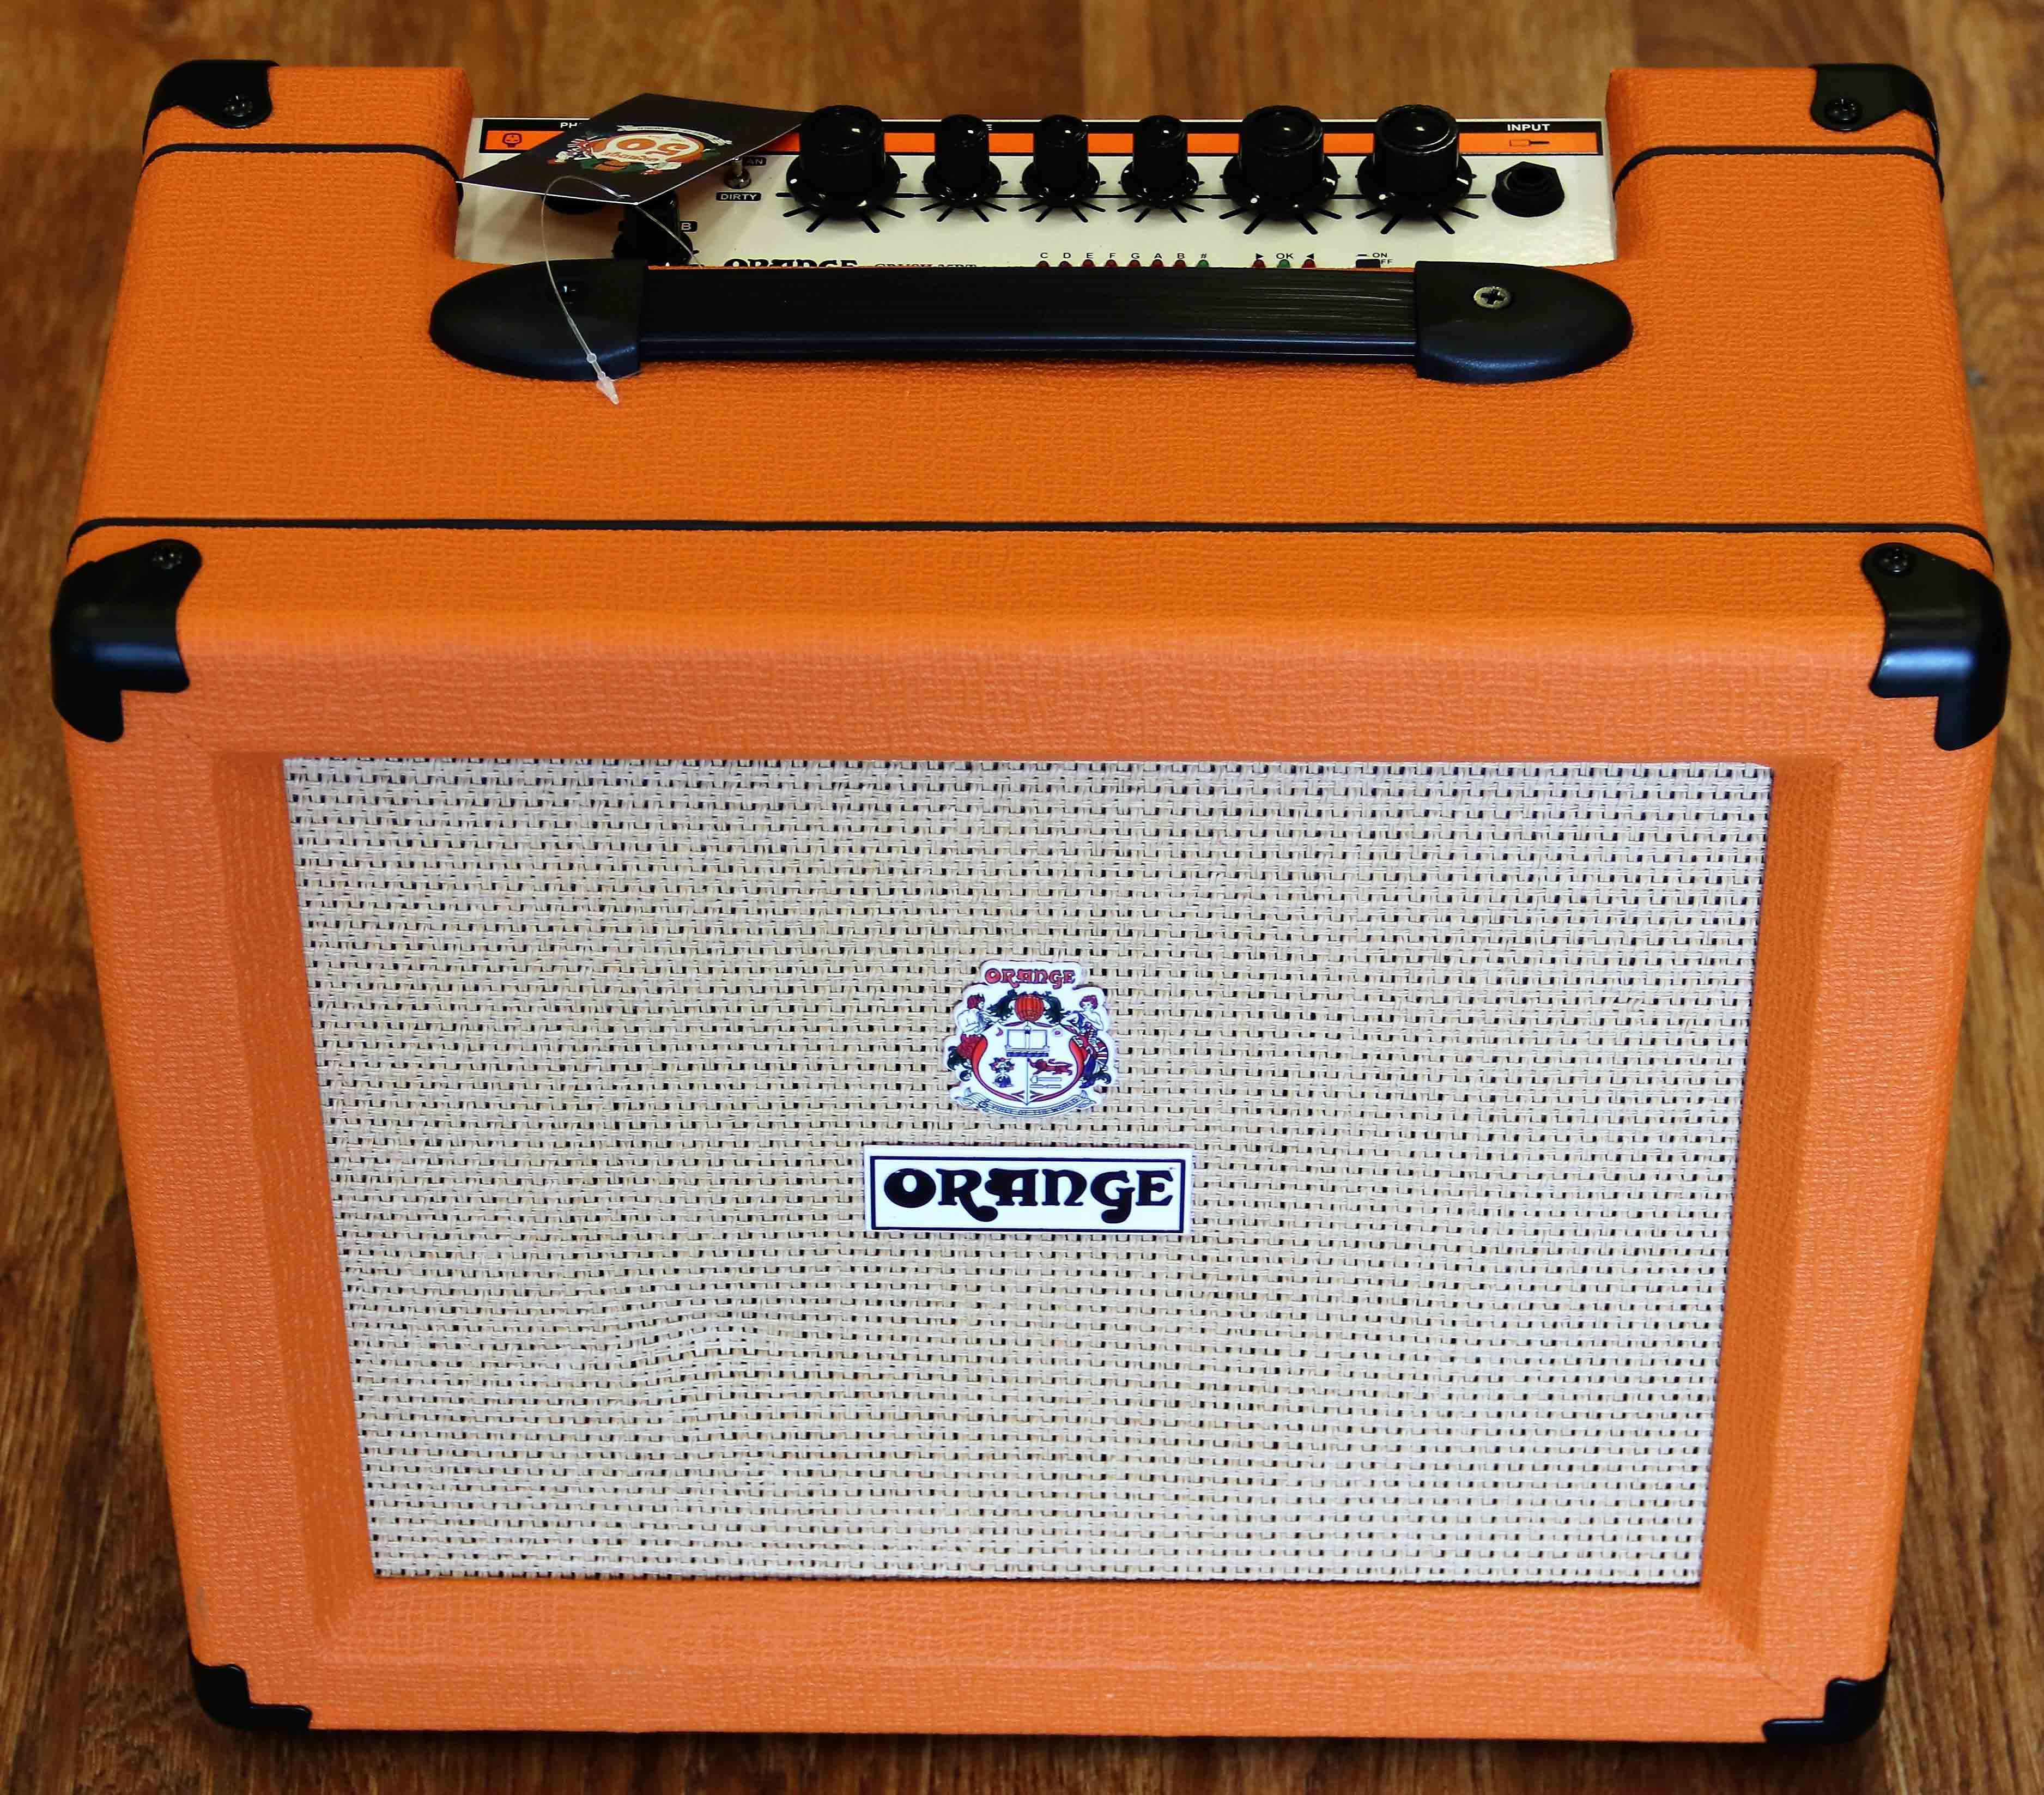 Orange-Crush-35RT-Guitar-Combo-Amplifier